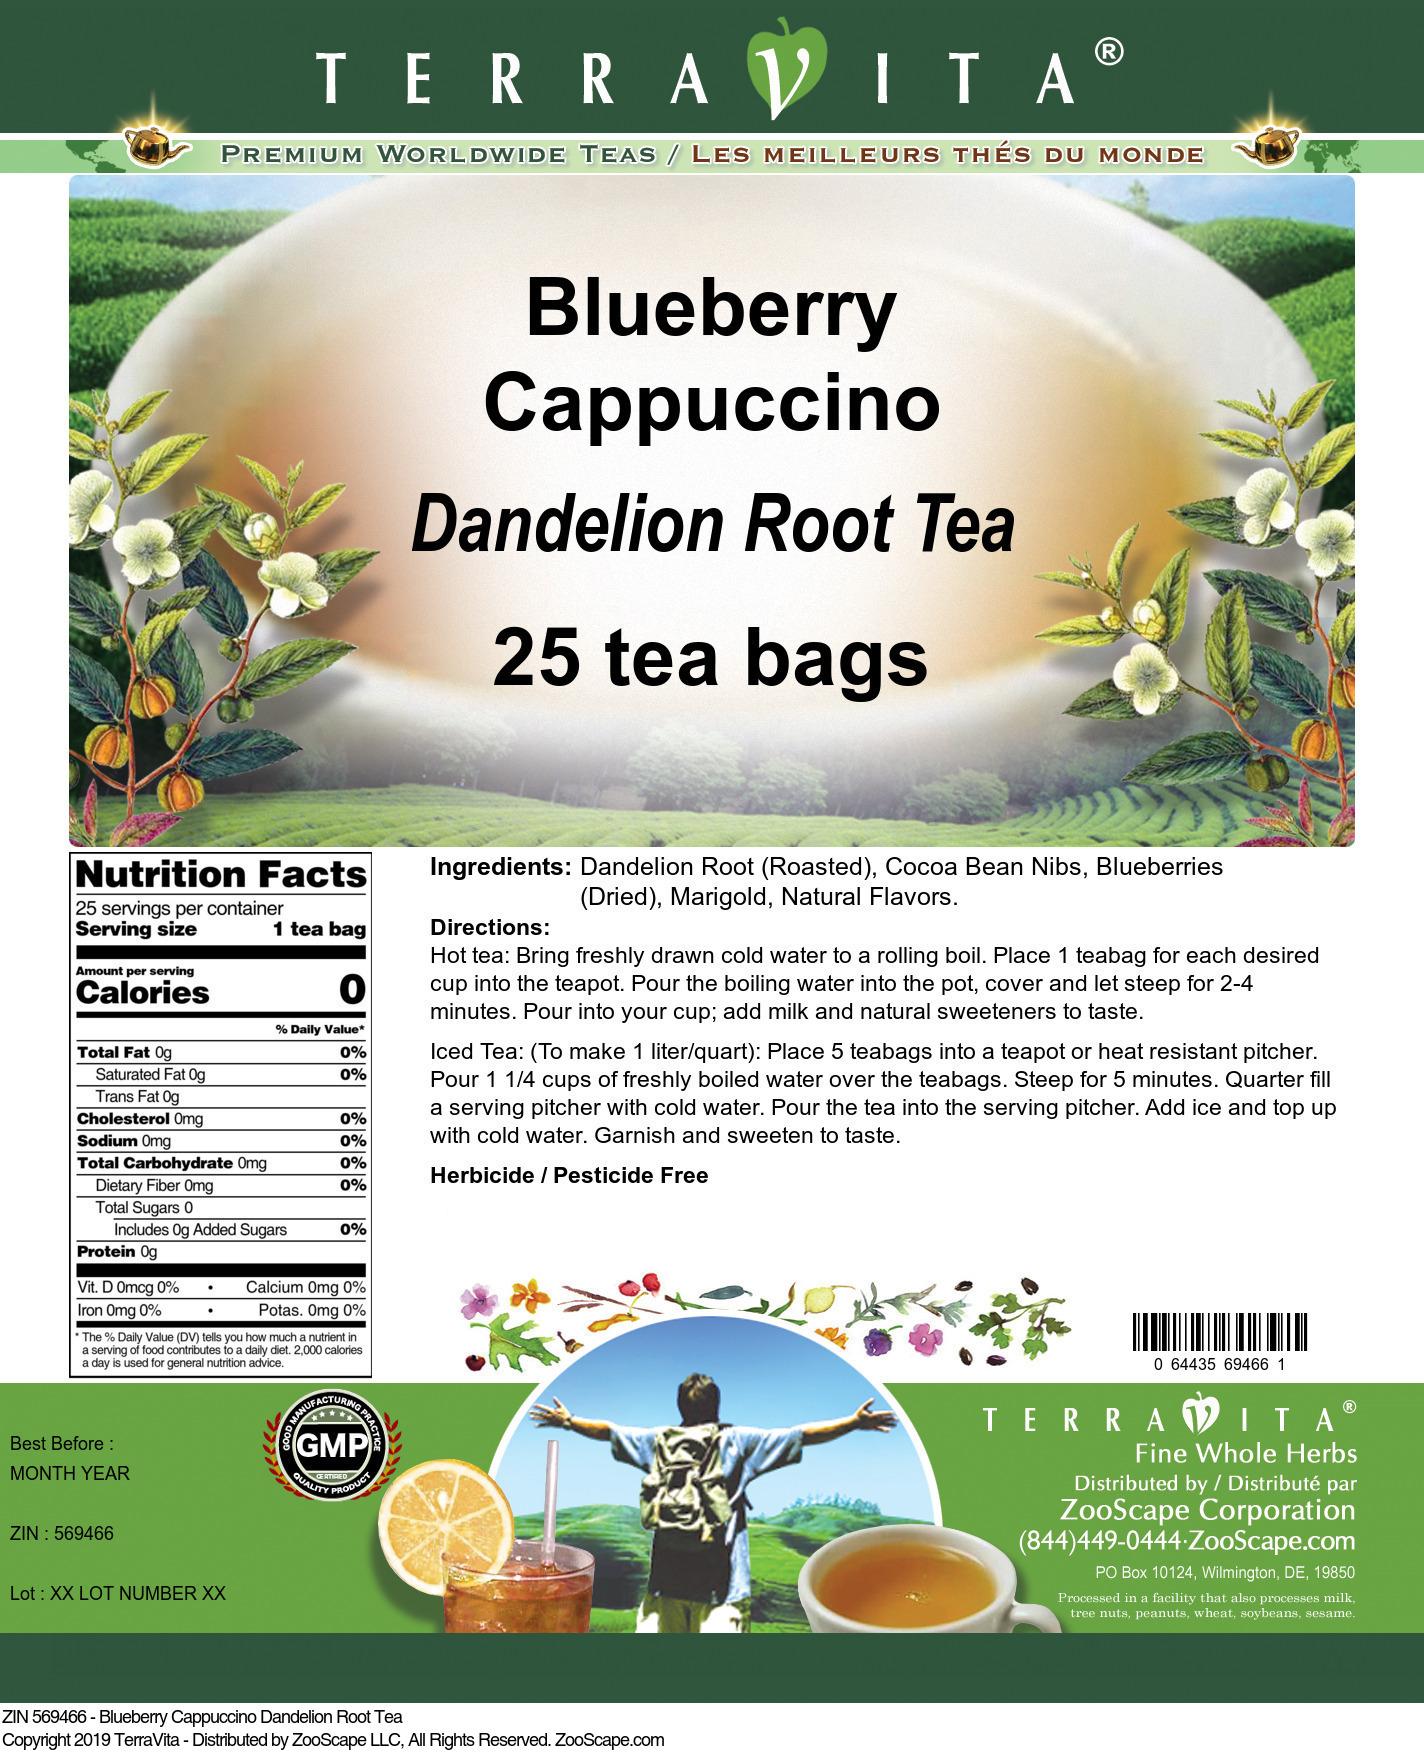 Blueberry Cappuccino Dandelion Root Tea